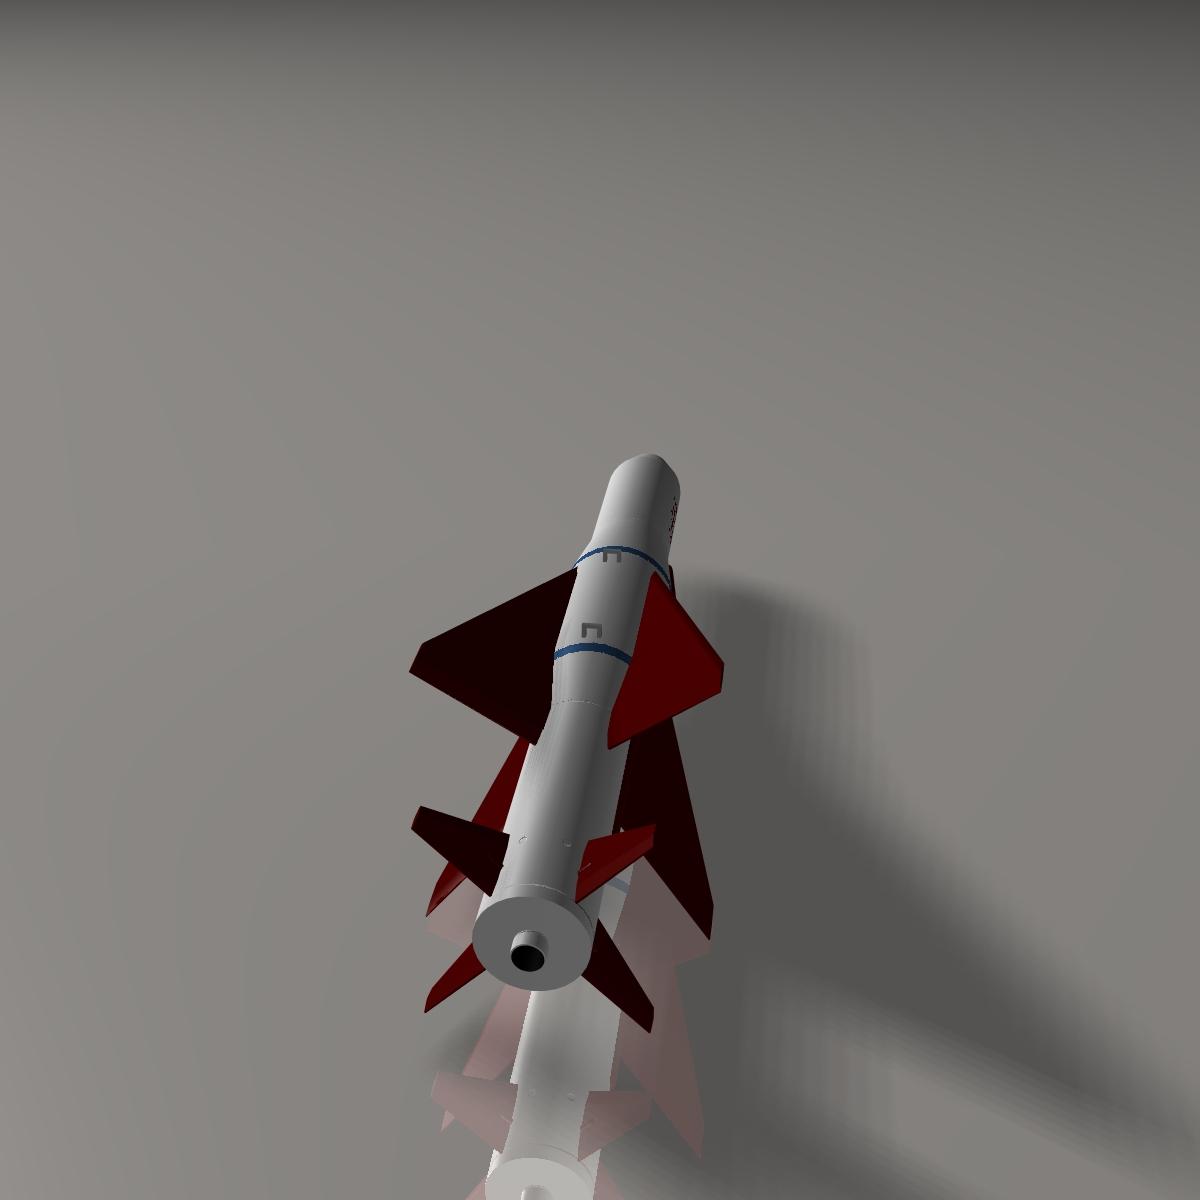 iranian agm-379 zoobin asm missile 3d model 3ds dxf fbx blend cob dae x obj 150588